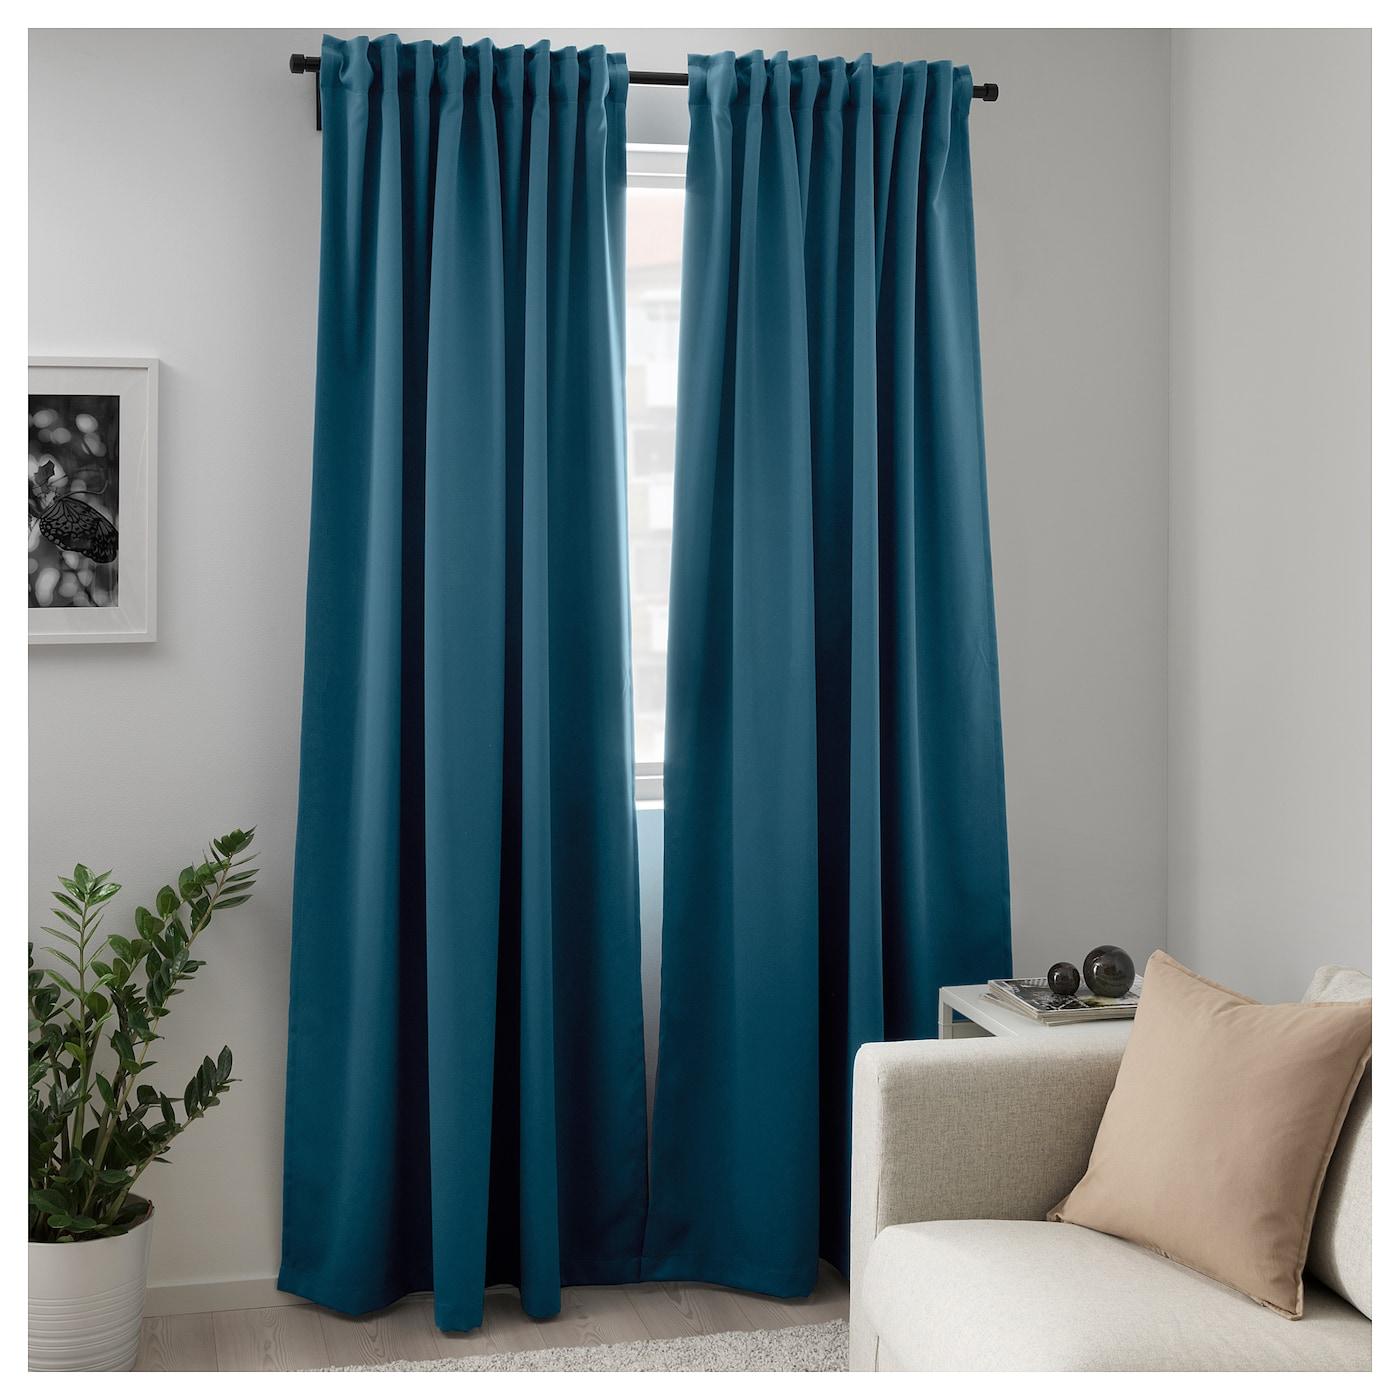 majgull rideaux occultant 1 paire bleu vert 145x300 cm ikea